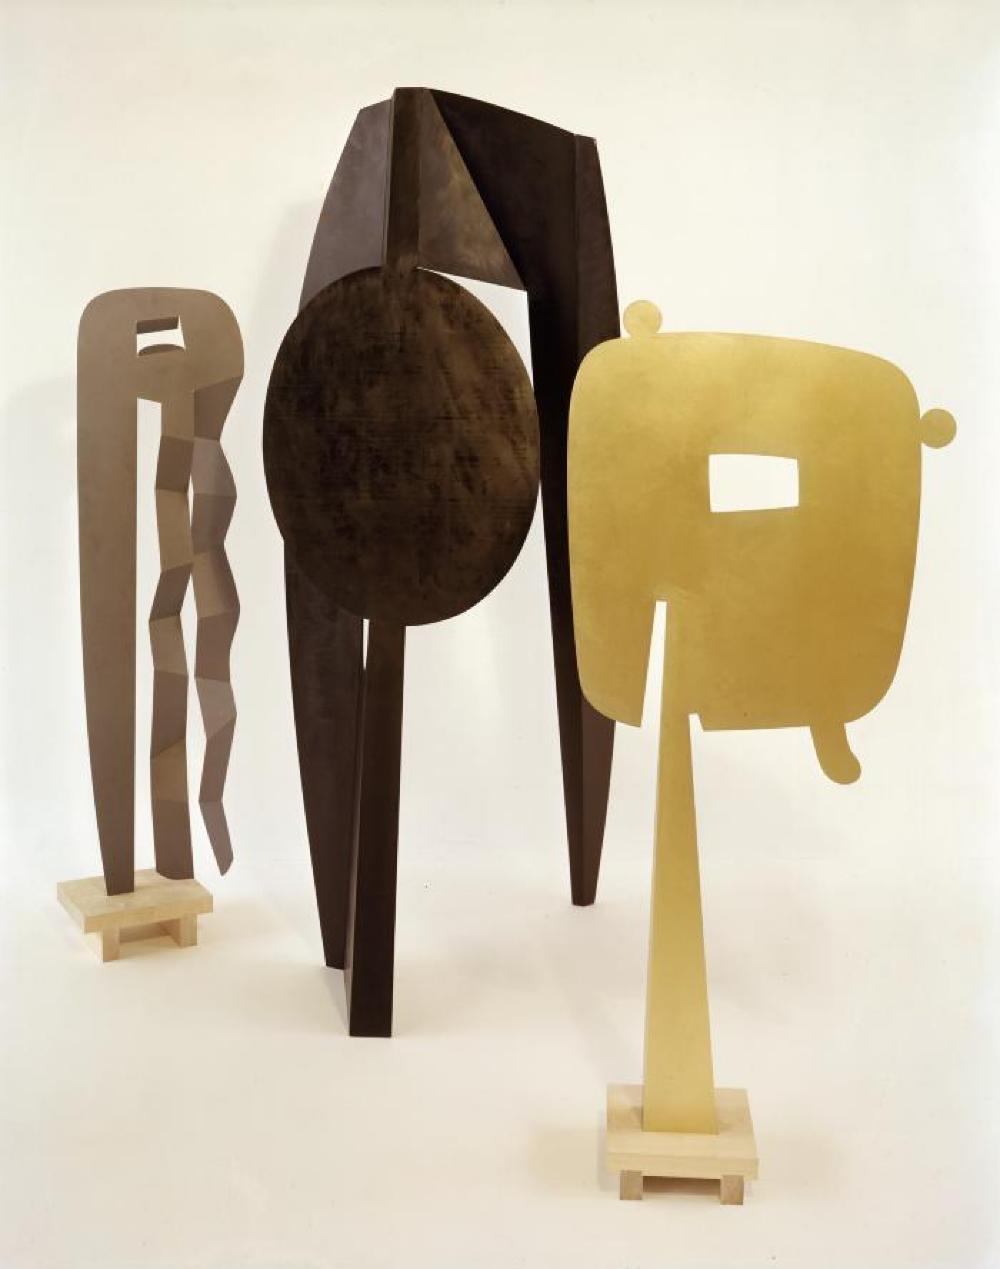 The Kite, 1959; The Mirror, 1958; Man Walking, 1959.